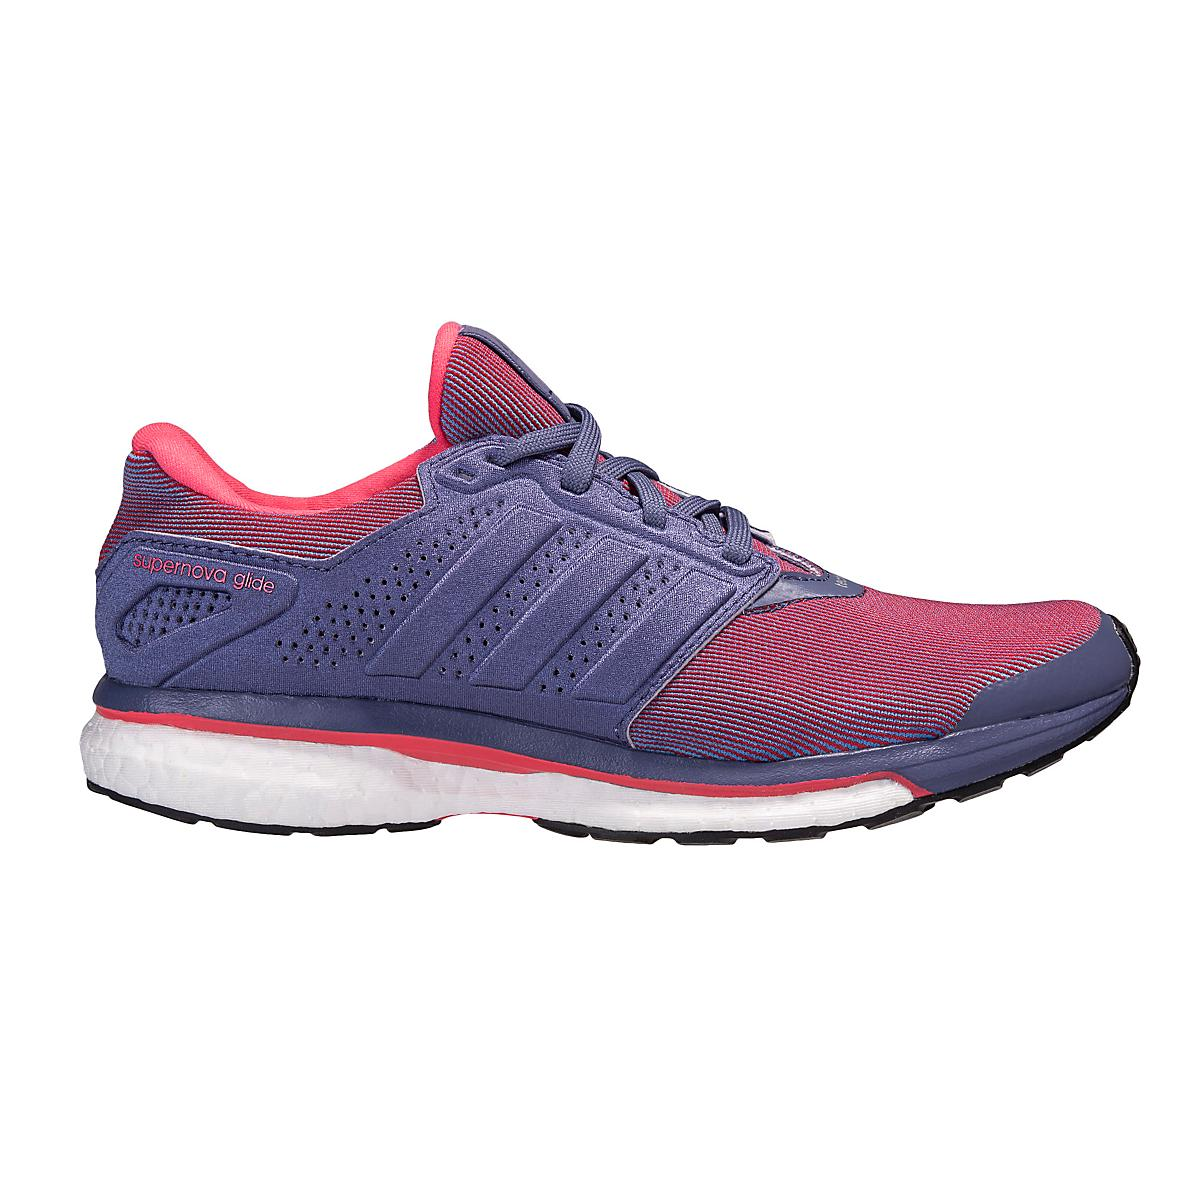 Womens adidas Supernova Glide 8 Running Shoe at Road Runner Sports 962c49e12